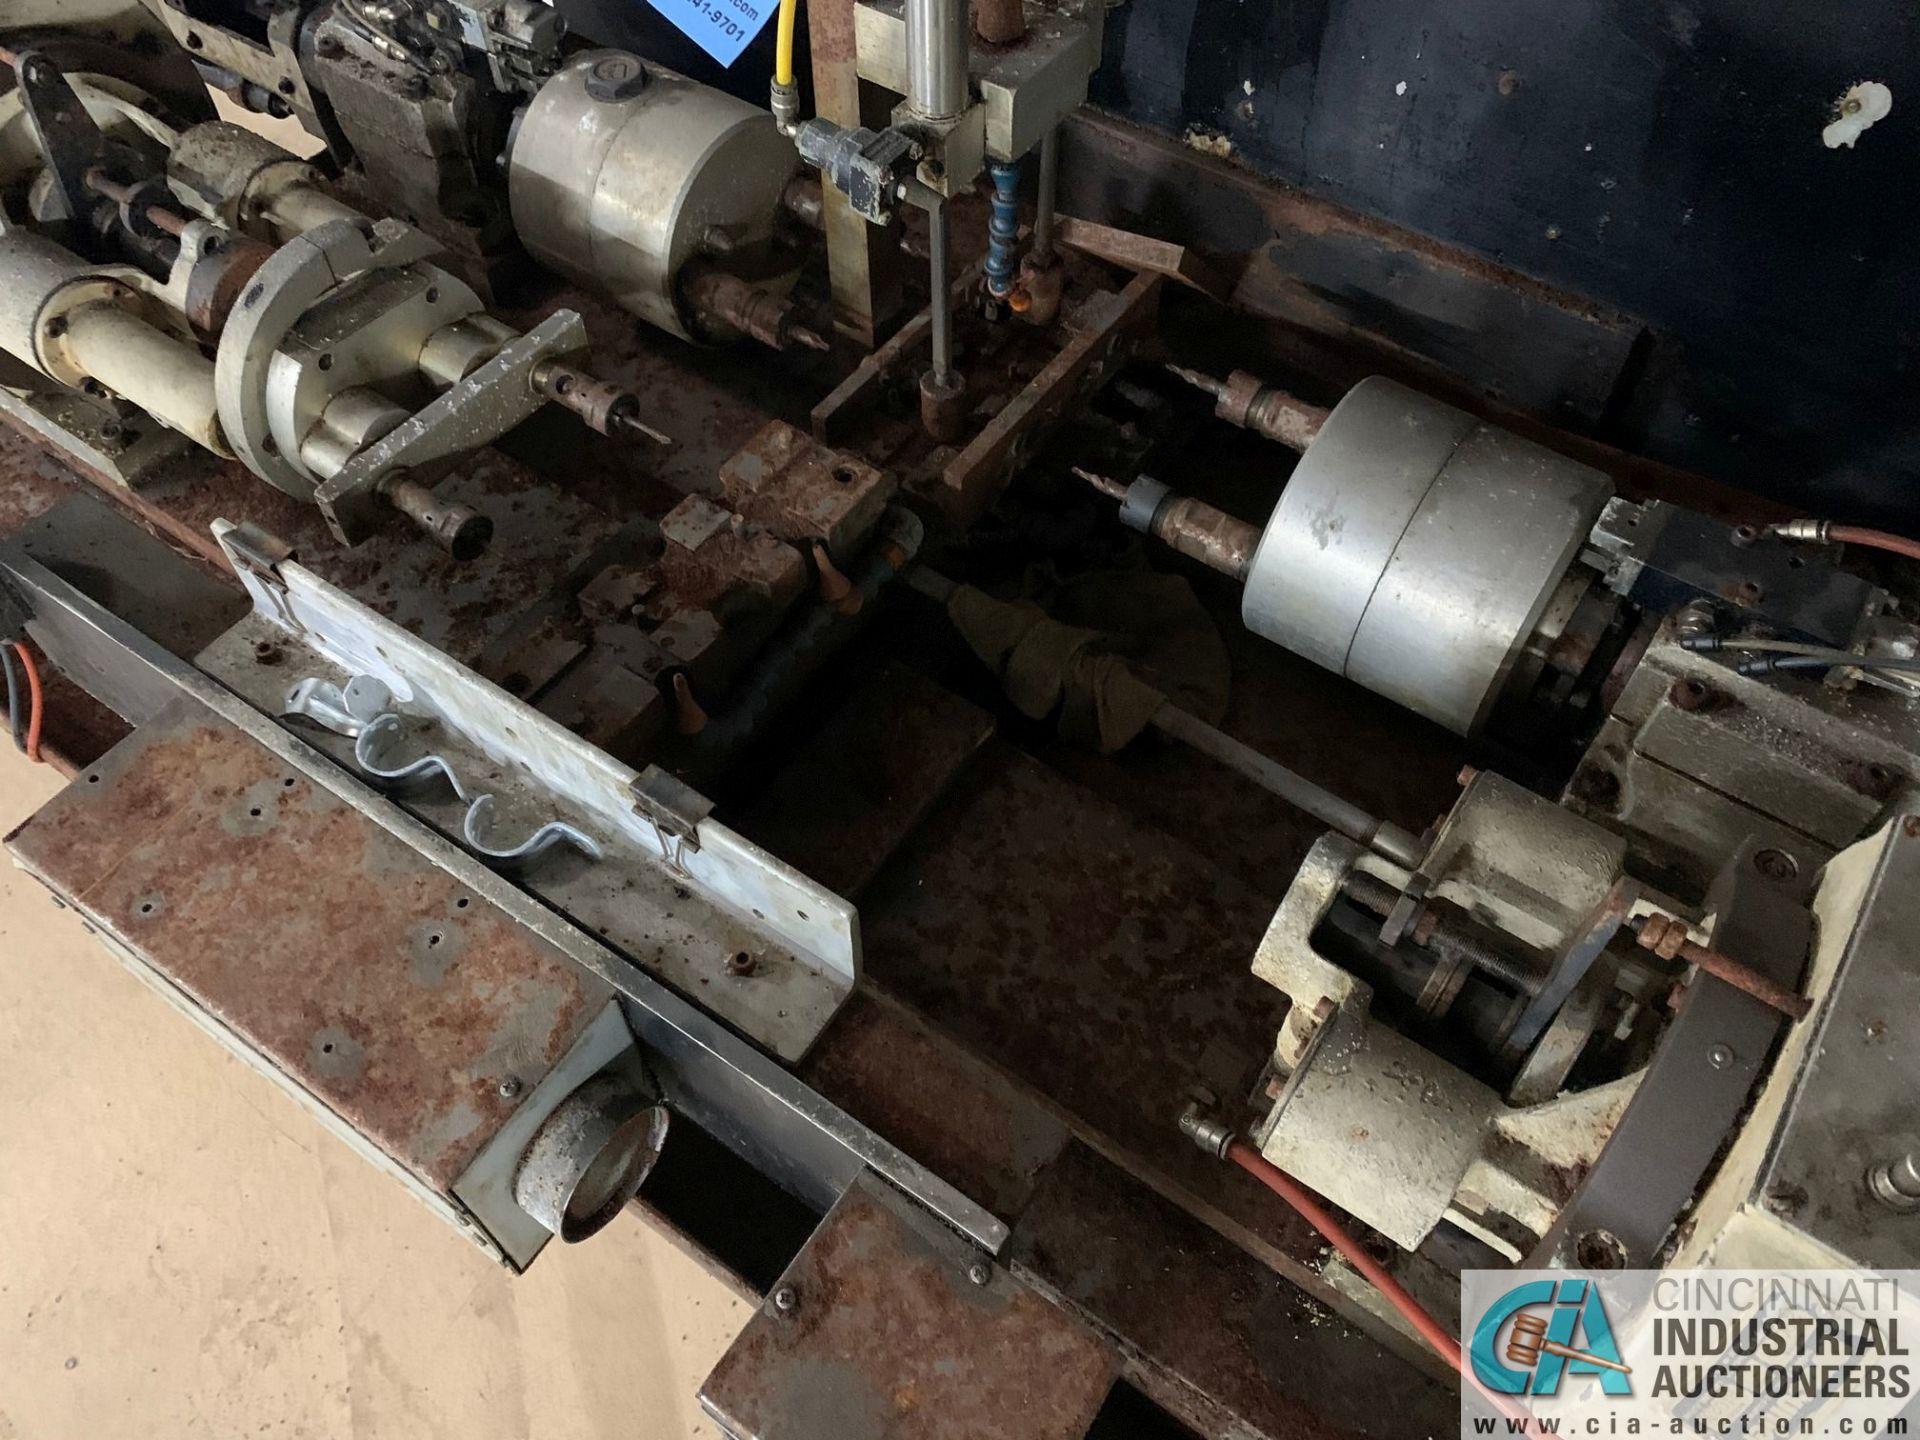 8-SPINDLE HORIZONTAL DRILLING MACHINE - Image 4 of 4